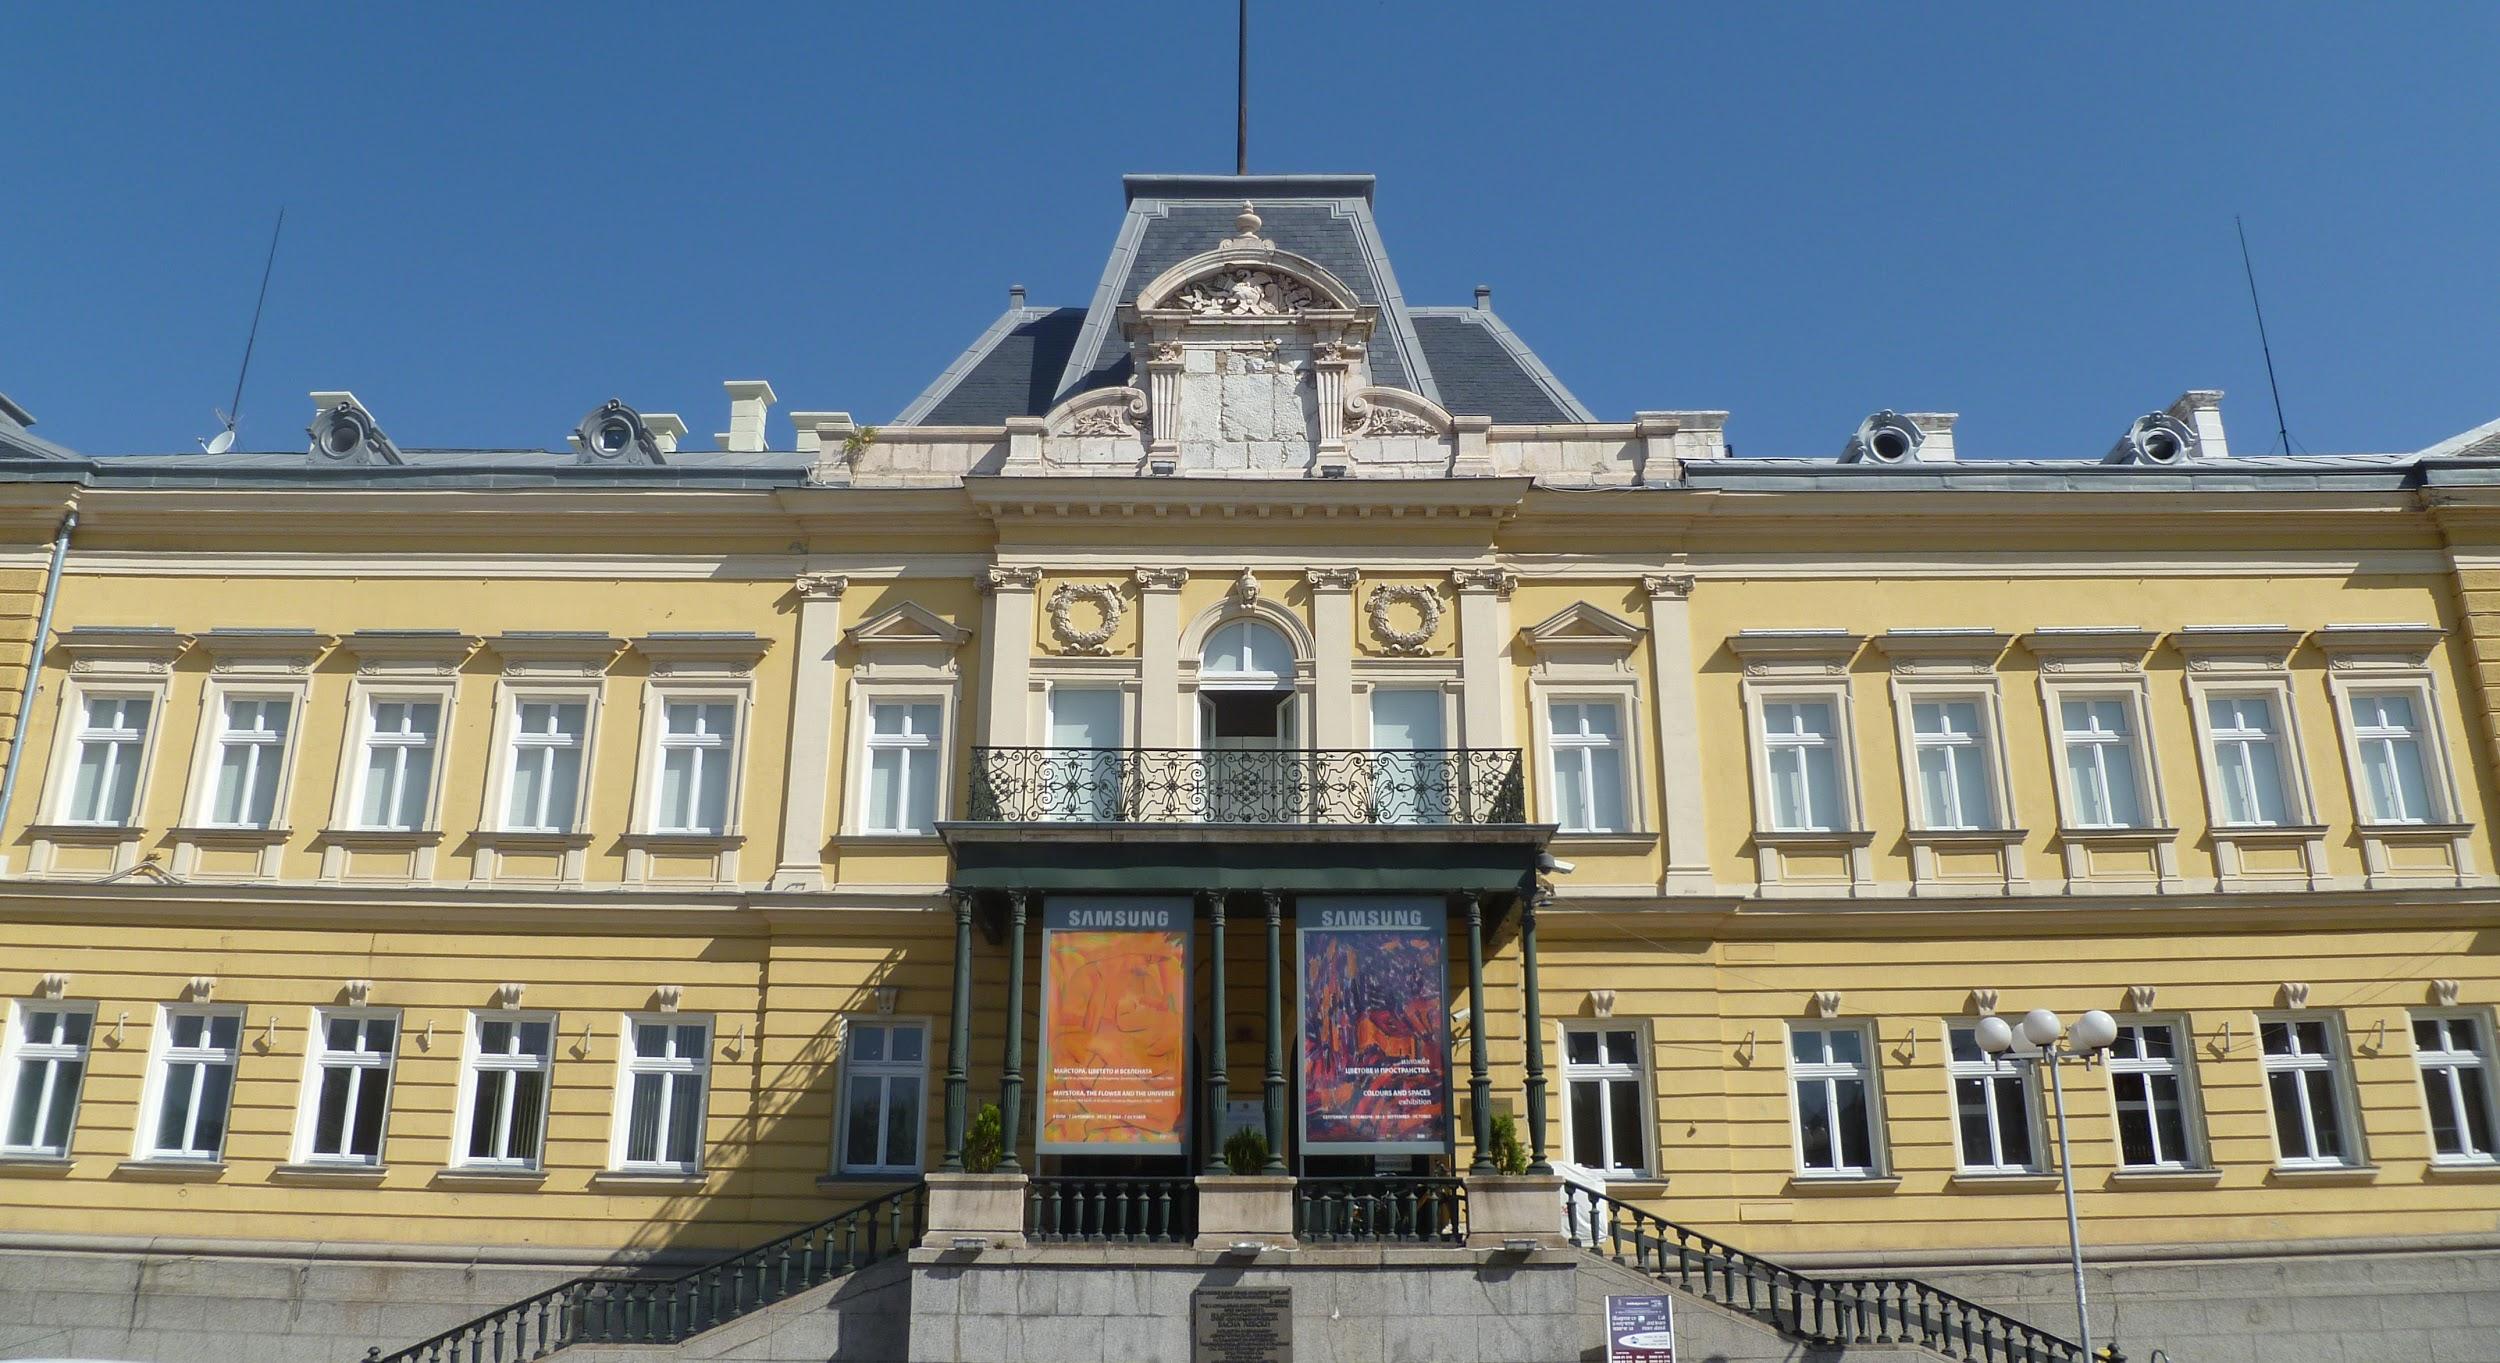 Sofia sightseeing destination - National Arts Gallery